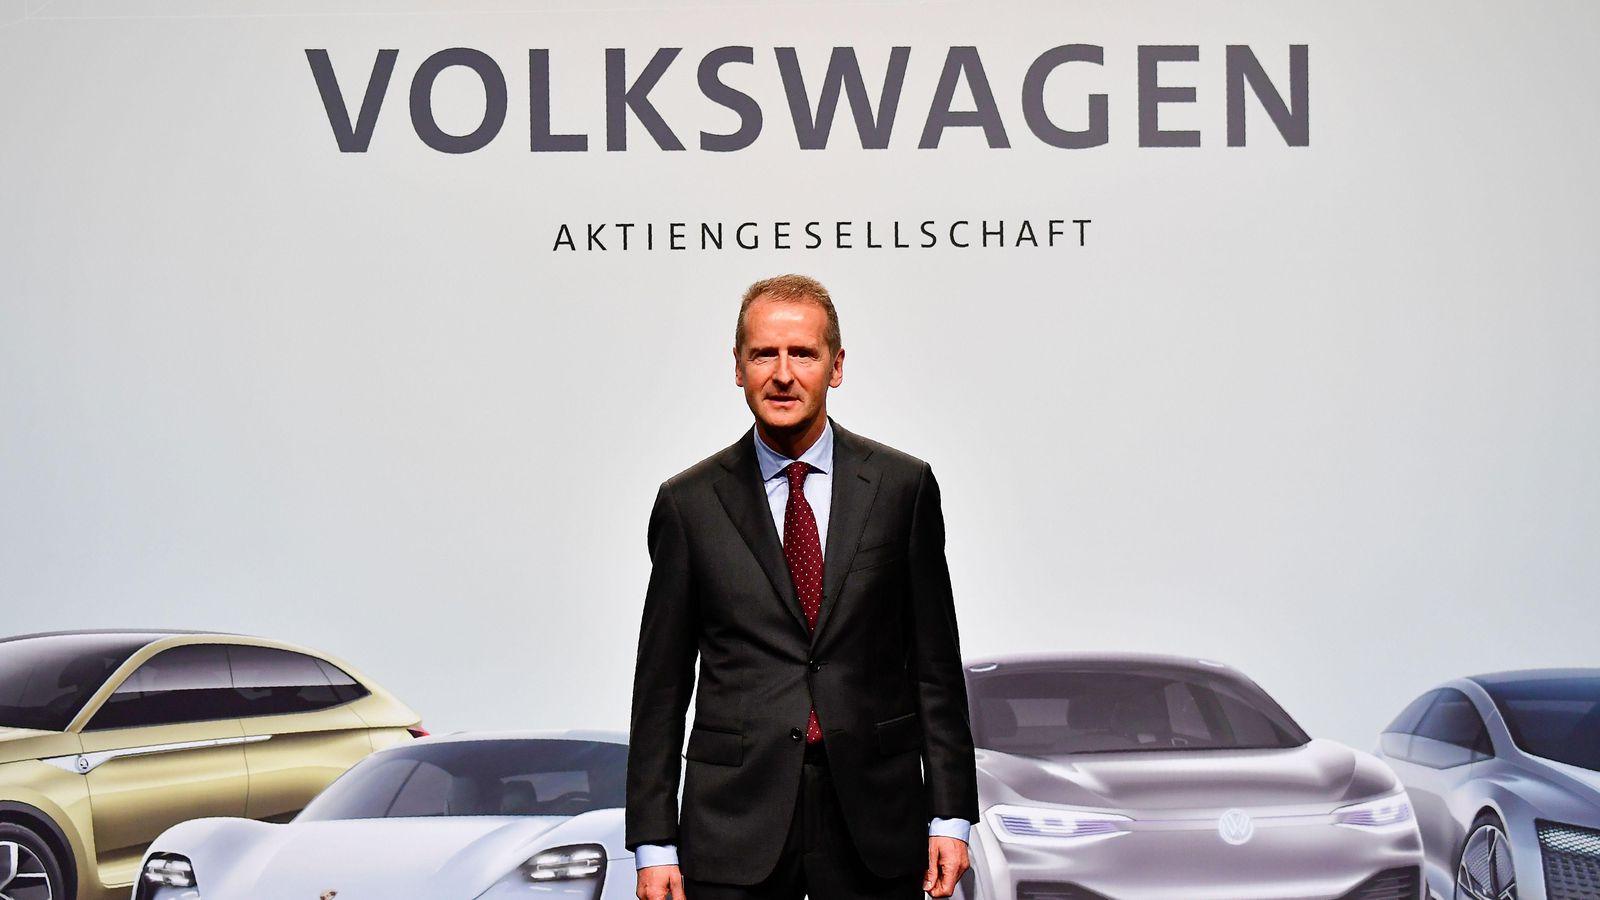 Dieselgate: VW investigada por pagamentos suspeitos a executivo suspenso